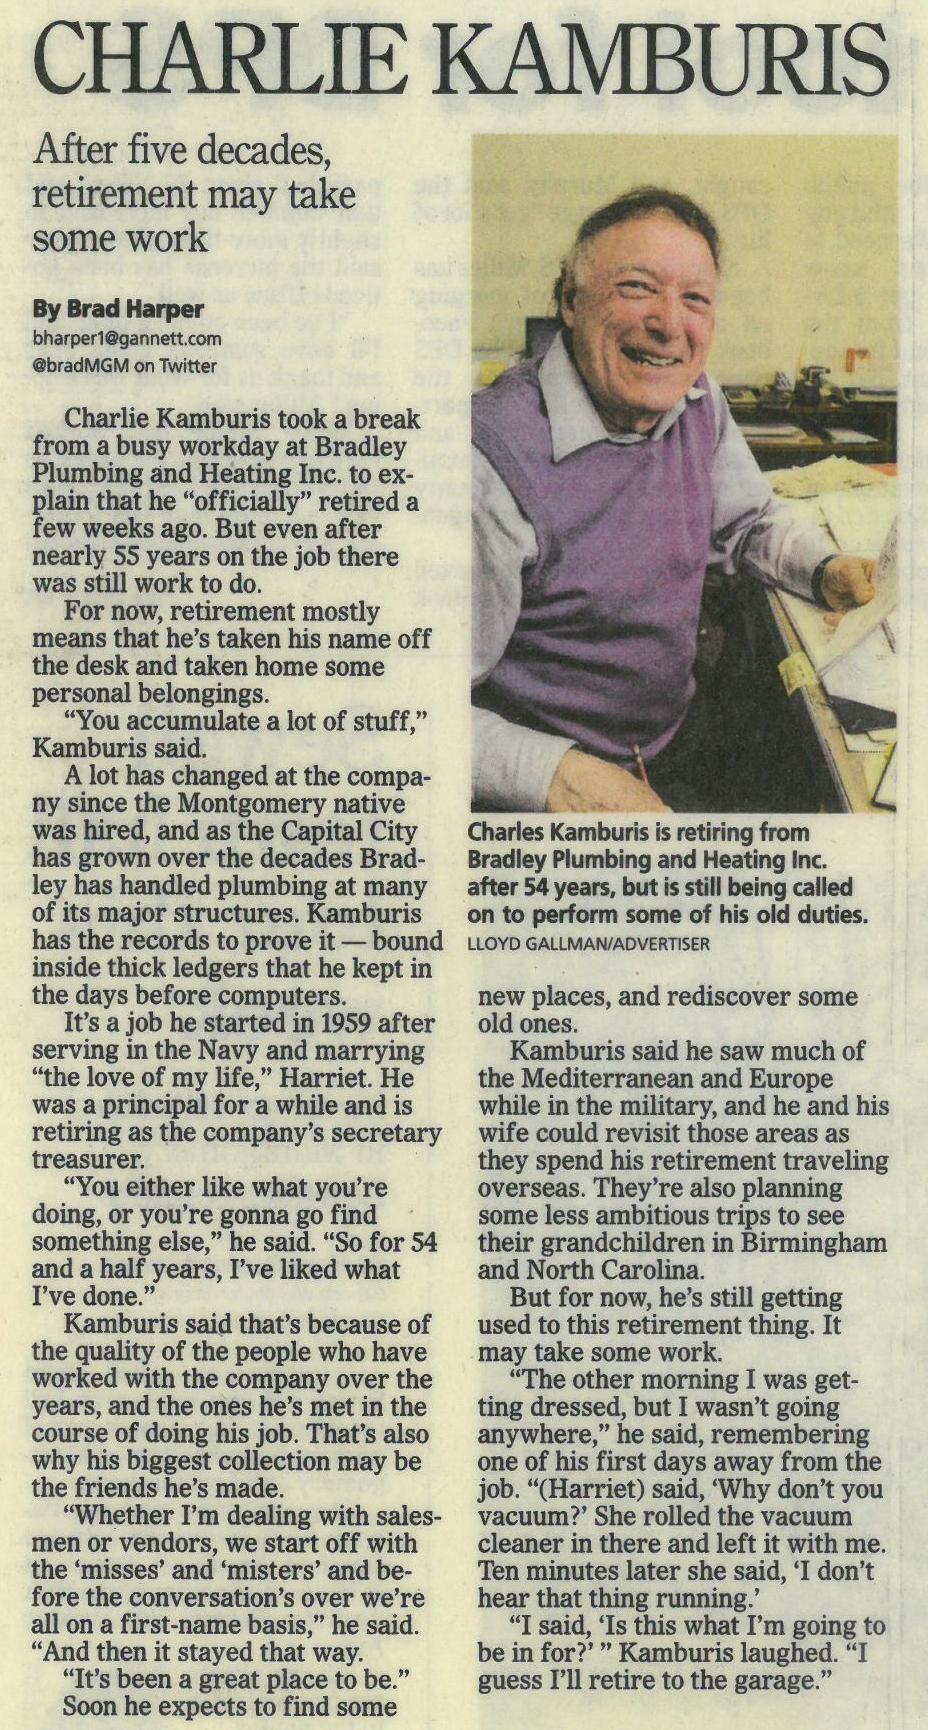 Charlie Kamburis retirement article